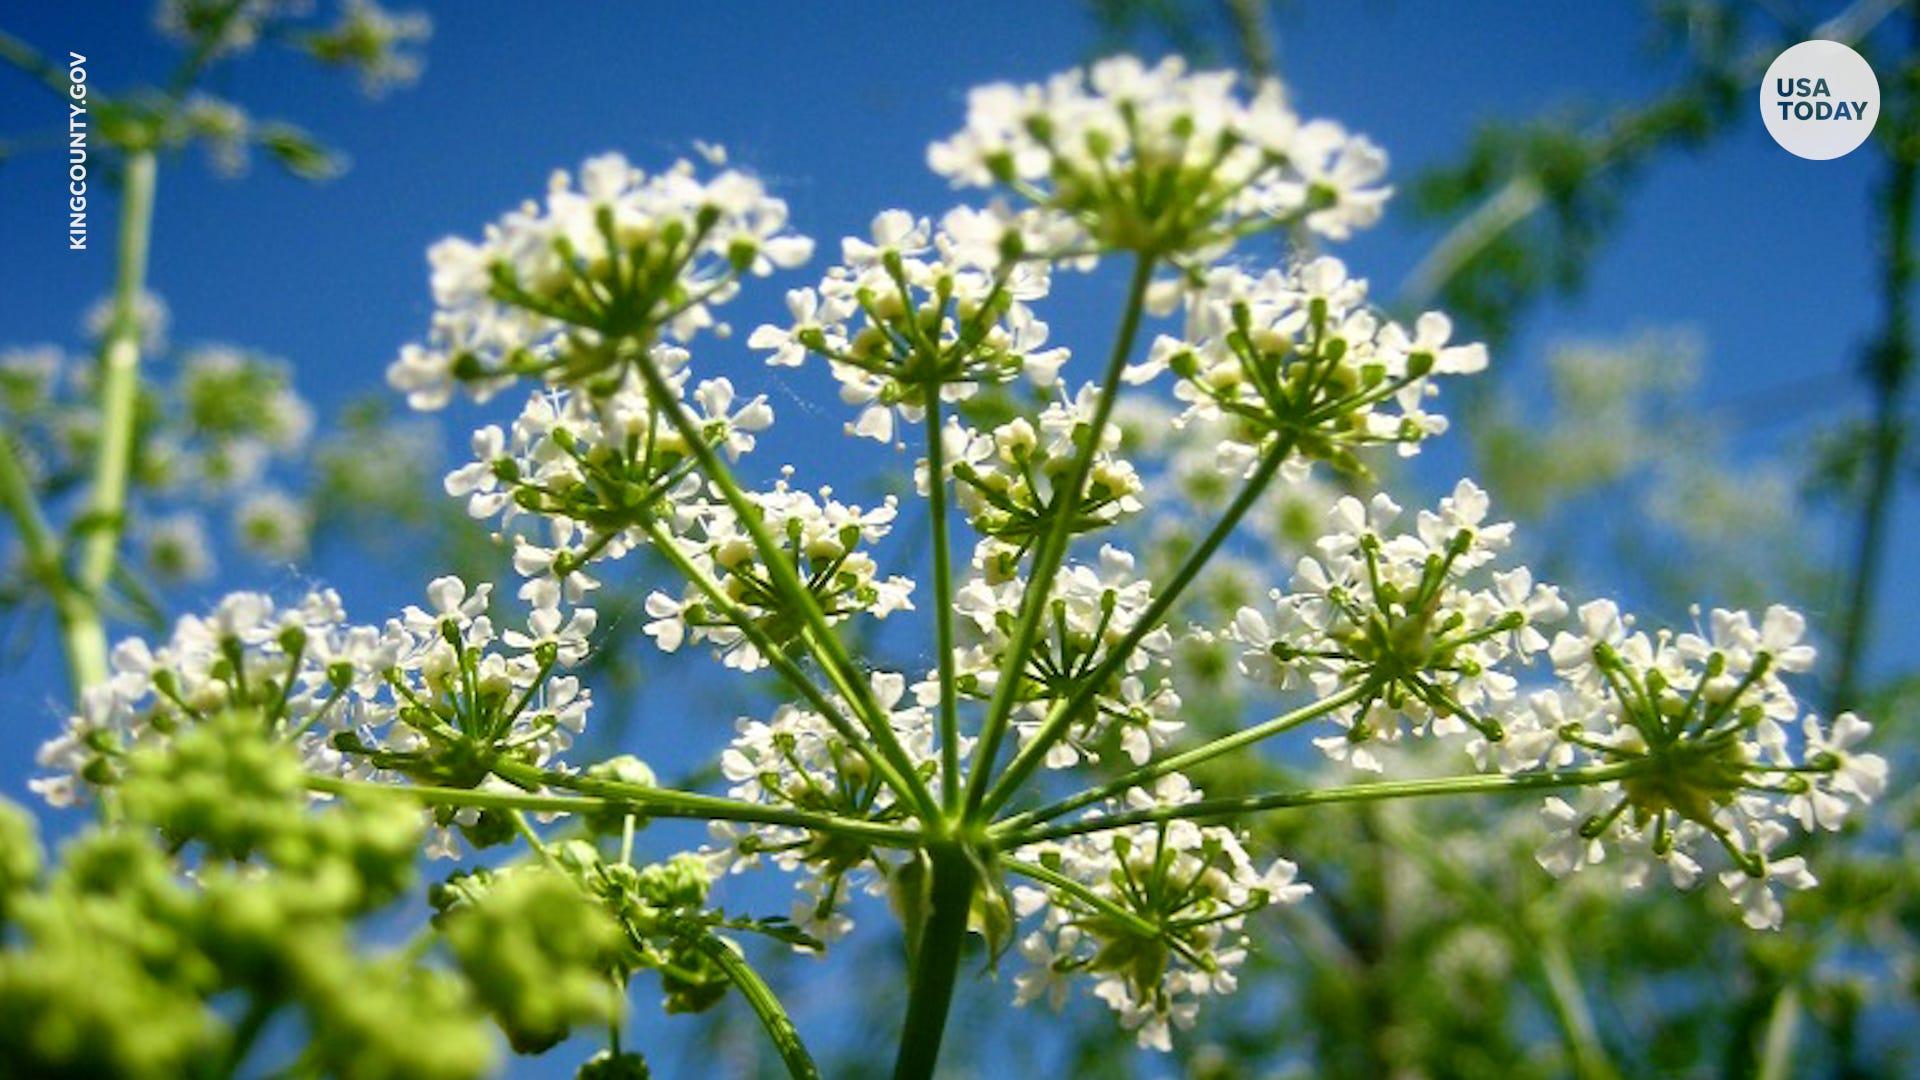 Poison Hemlock: Deadly invasive species rapidly spreading across the US